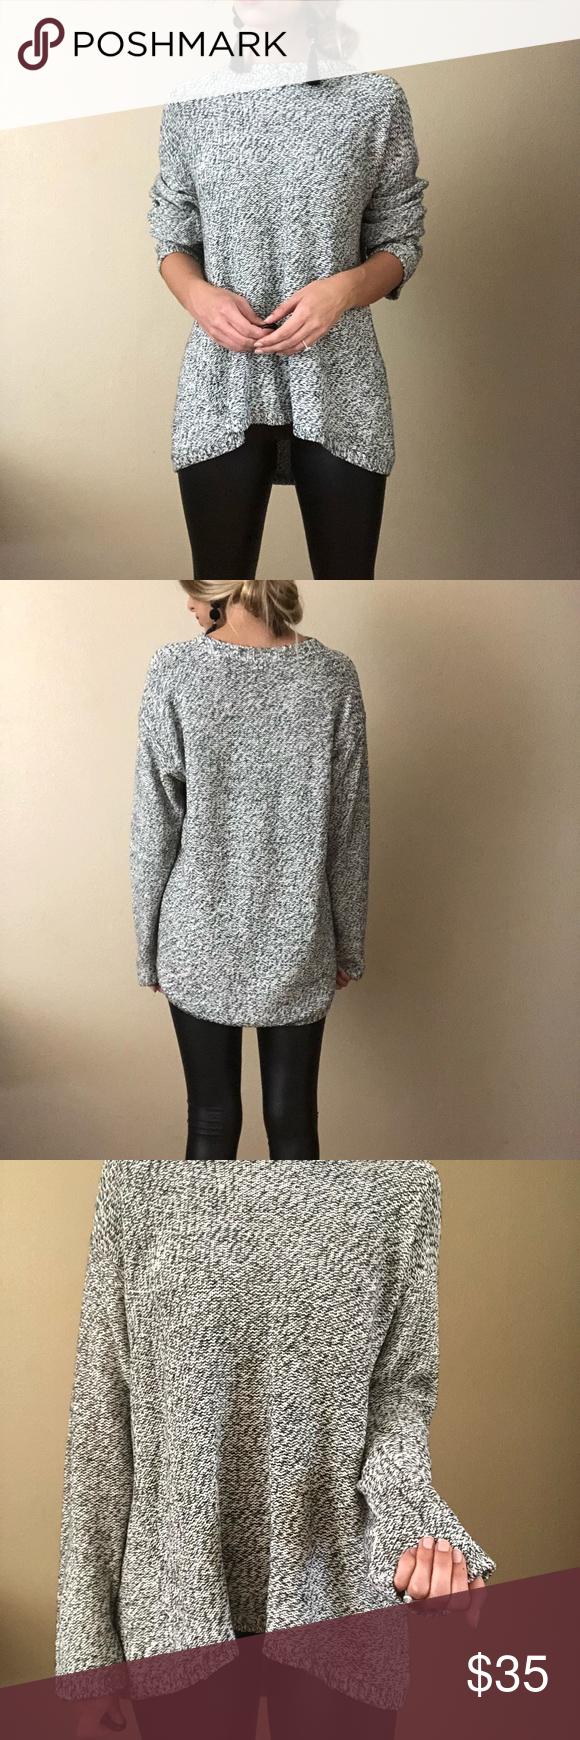 Philosophy Oversized Sweater Oversized Sweater Sweaters Women Shopping